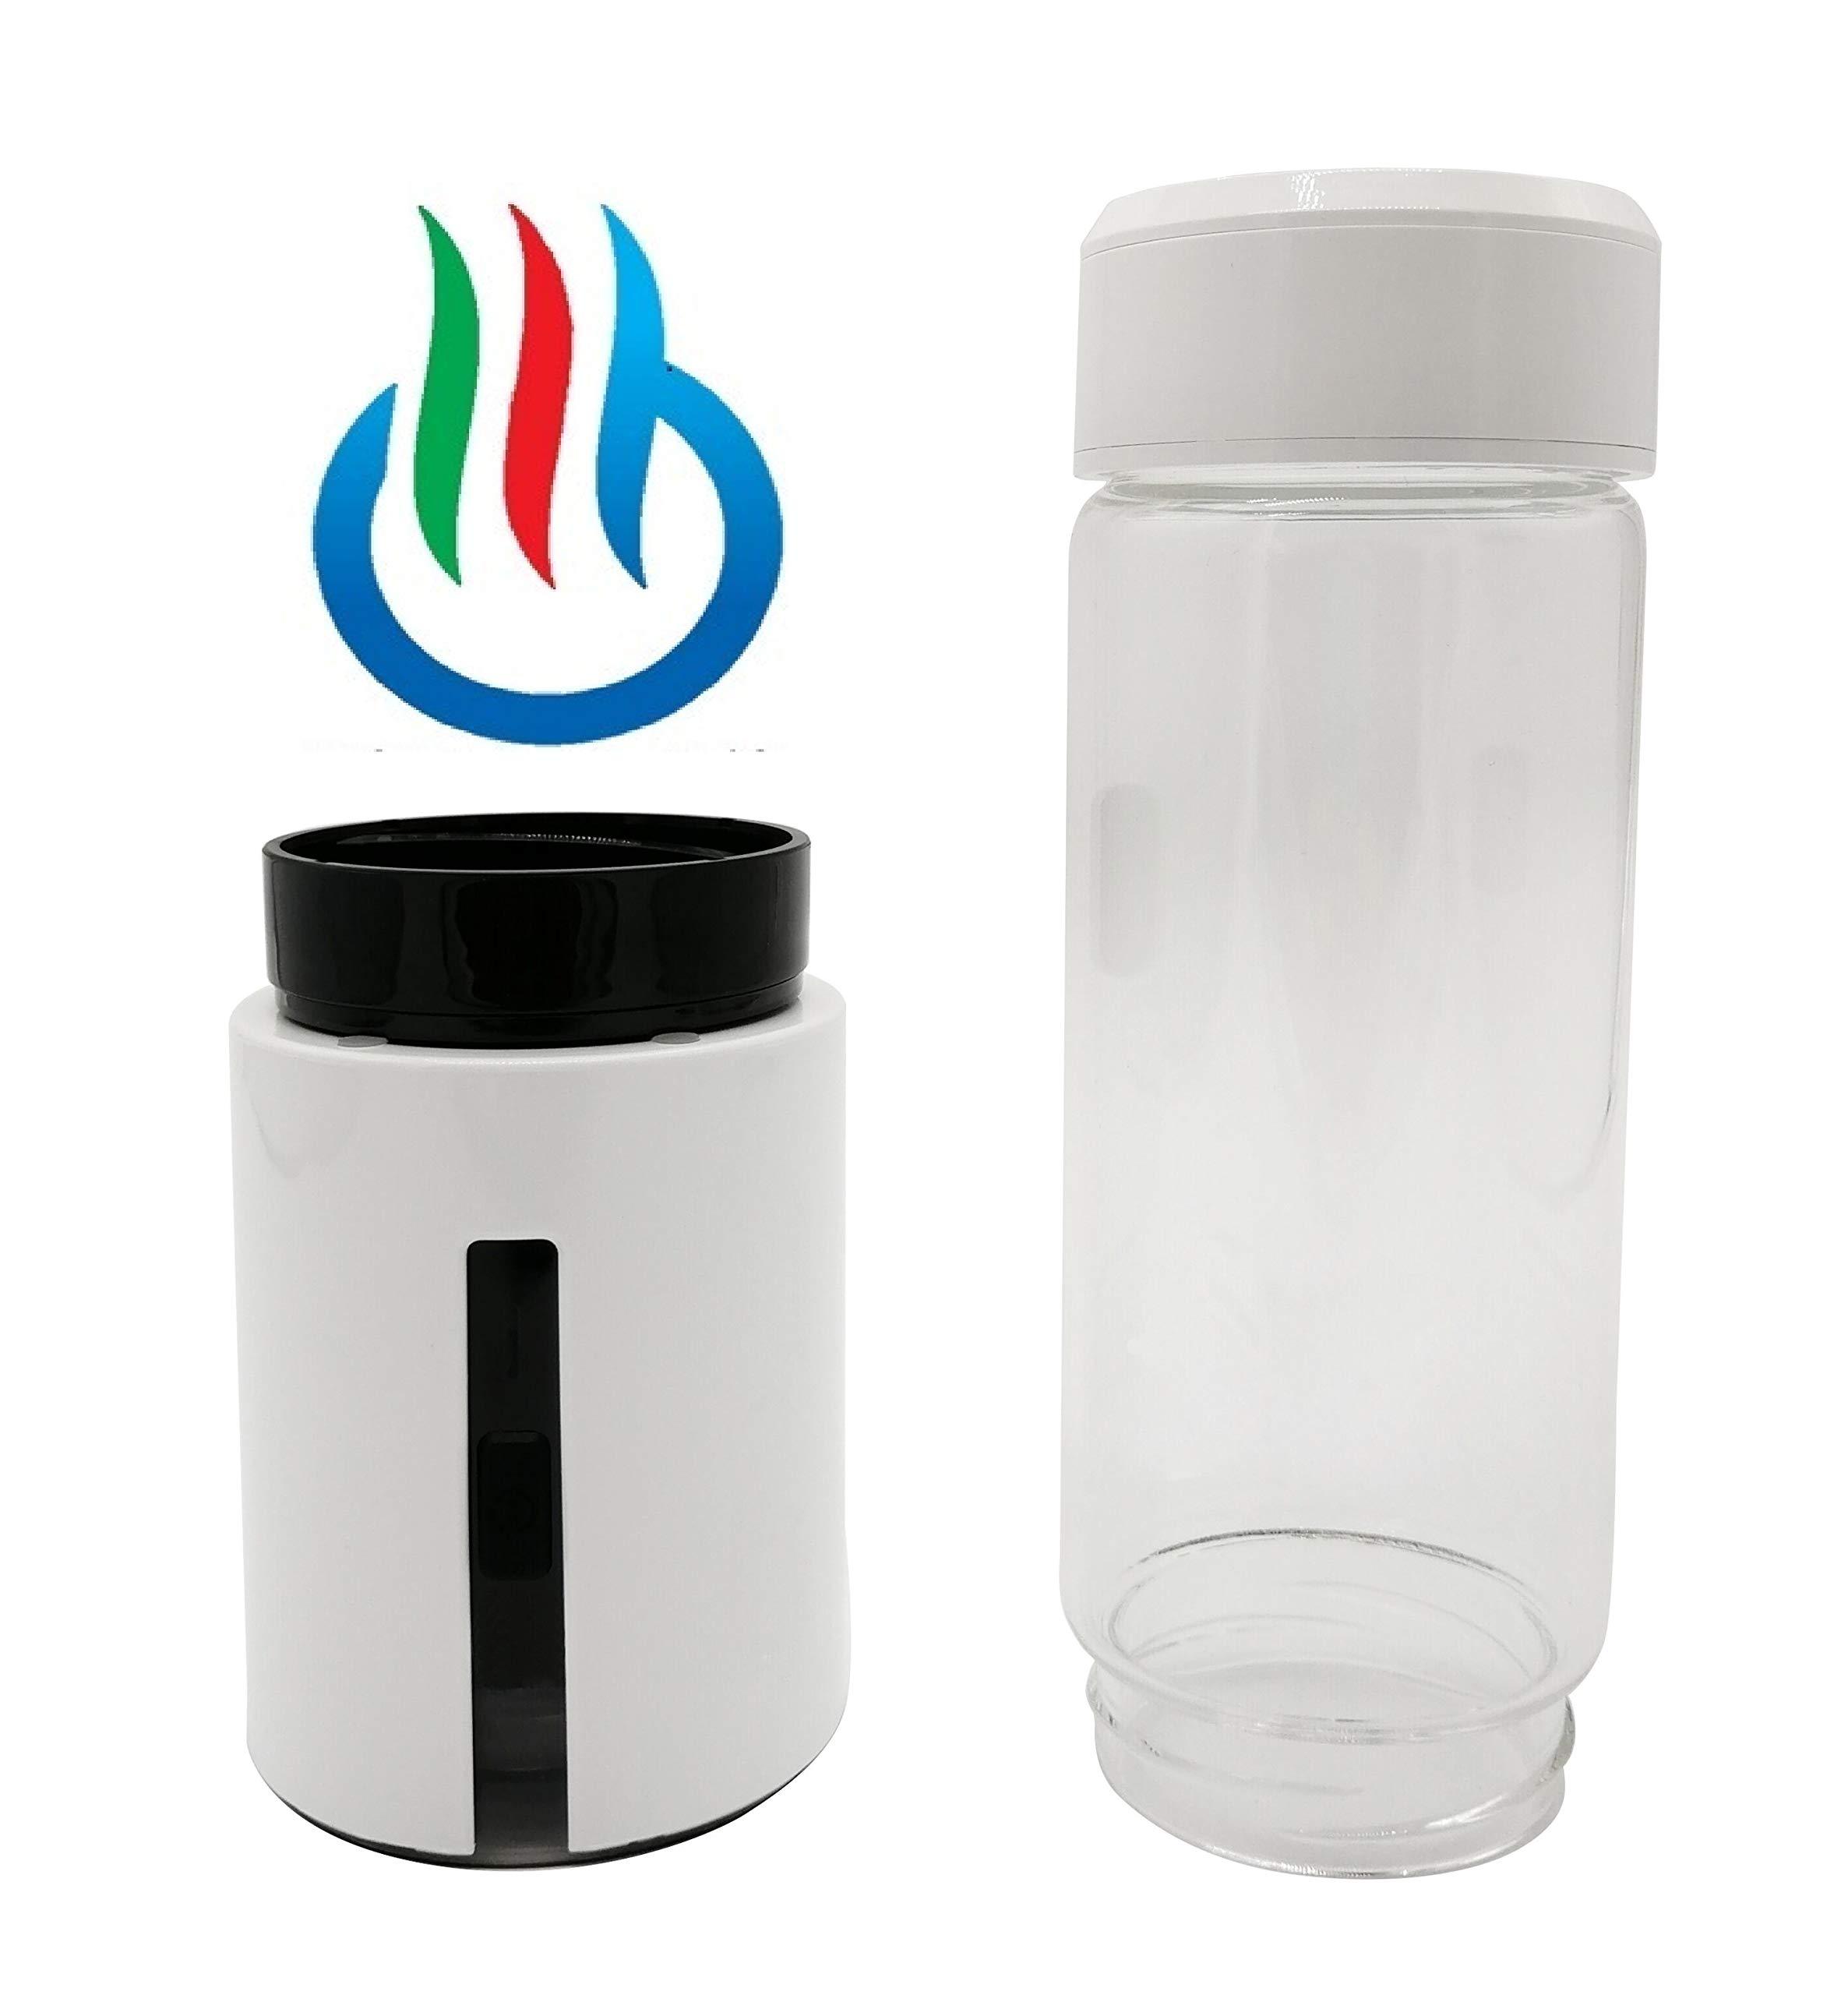 H2 USB Sport Pro II Portable Hydrogen Water Generator with Glass Bottle